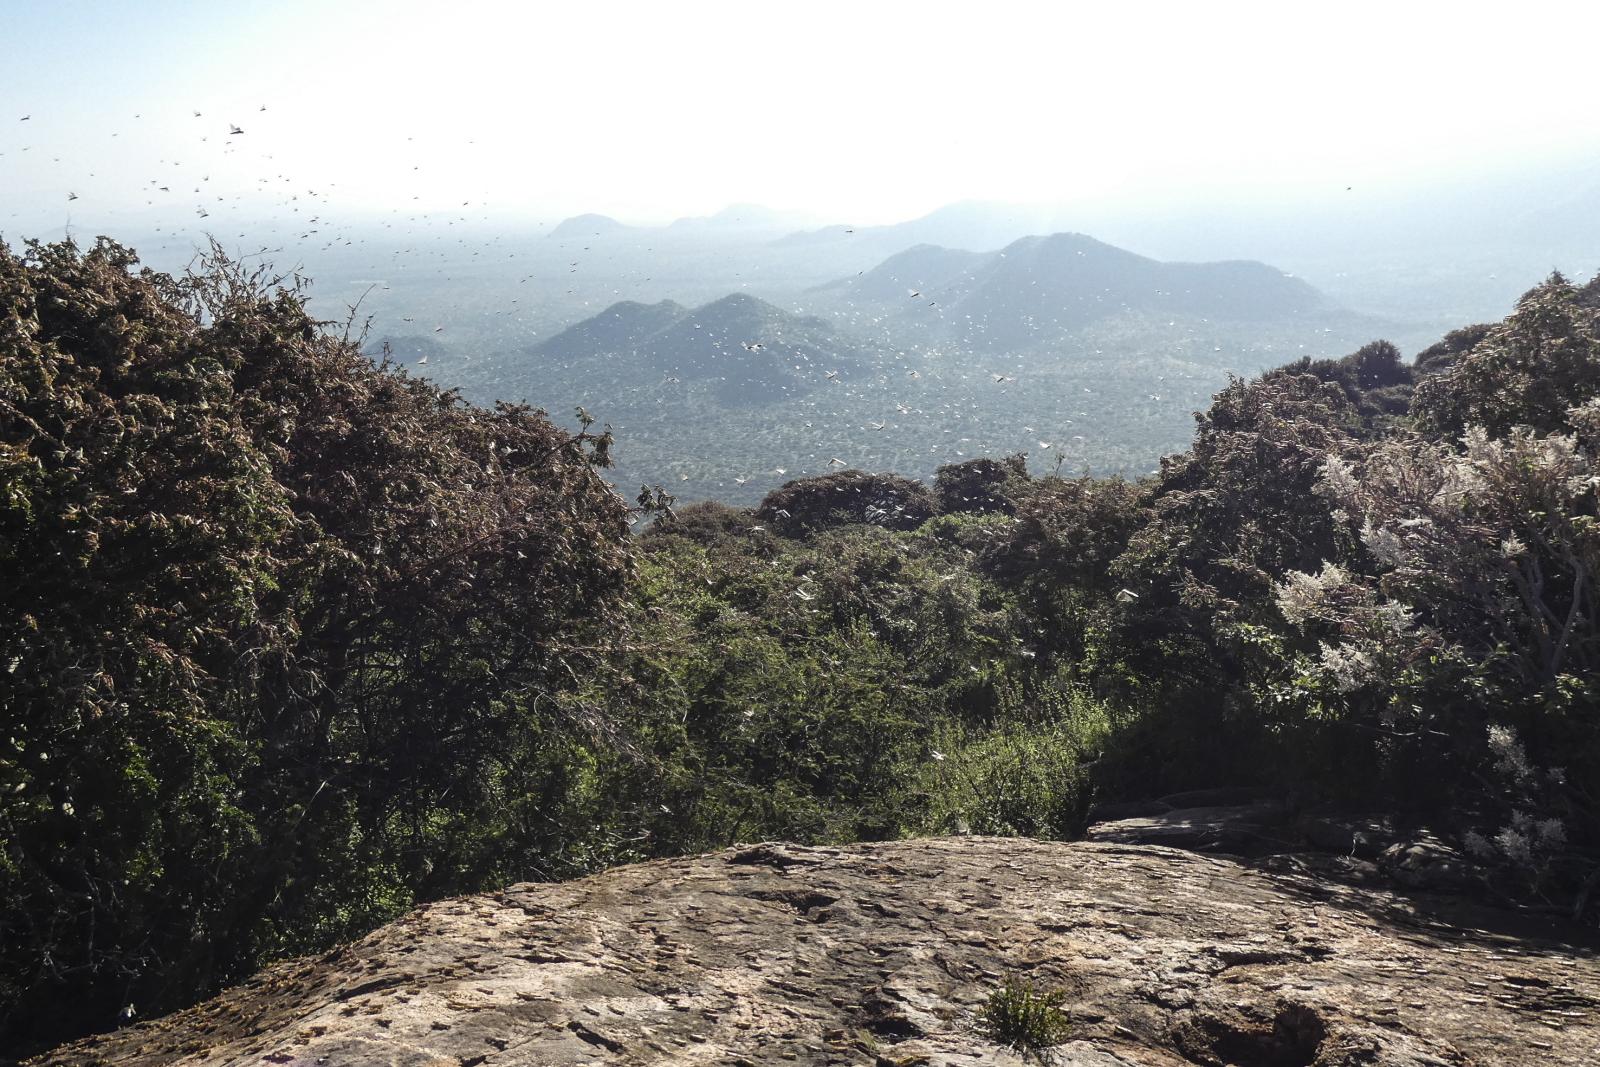 Krajobraz Kenii fot. EPA/THE LAIKIPIA FARMERS' ASSOCIATION